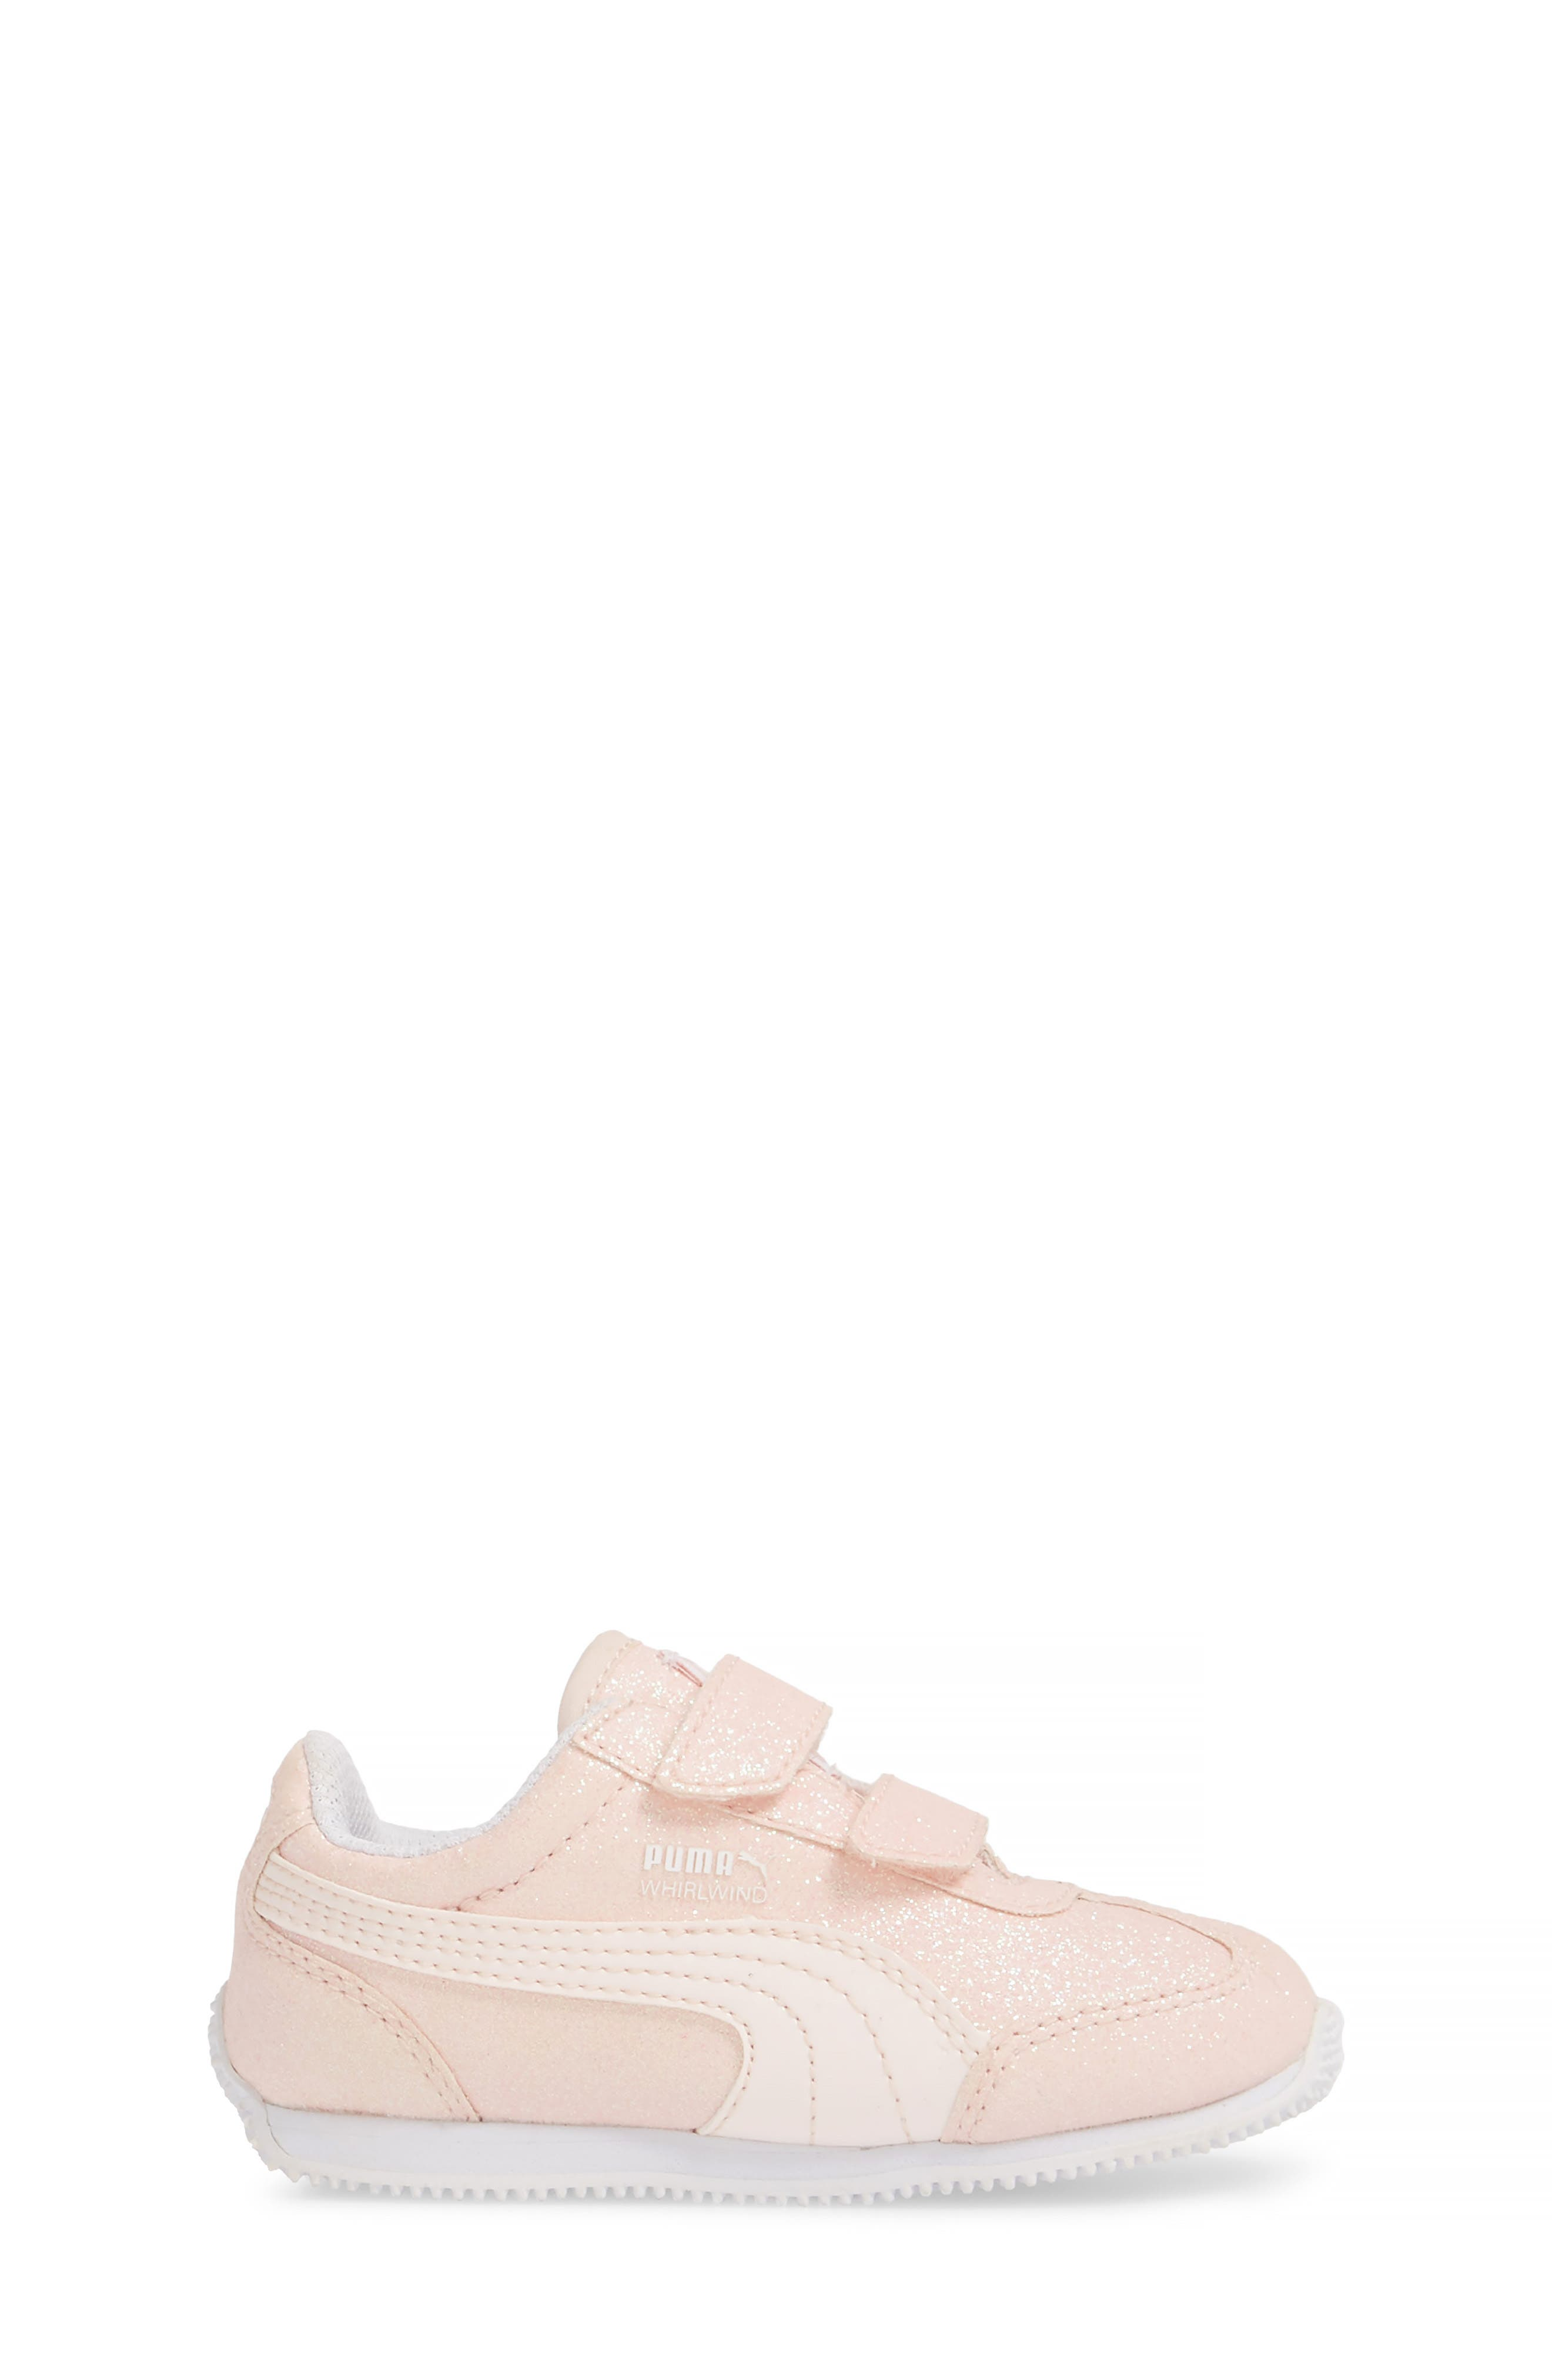 PUMA, Whirlwind Glitz Sneaker, Alternate thumbnail 3, color, 690